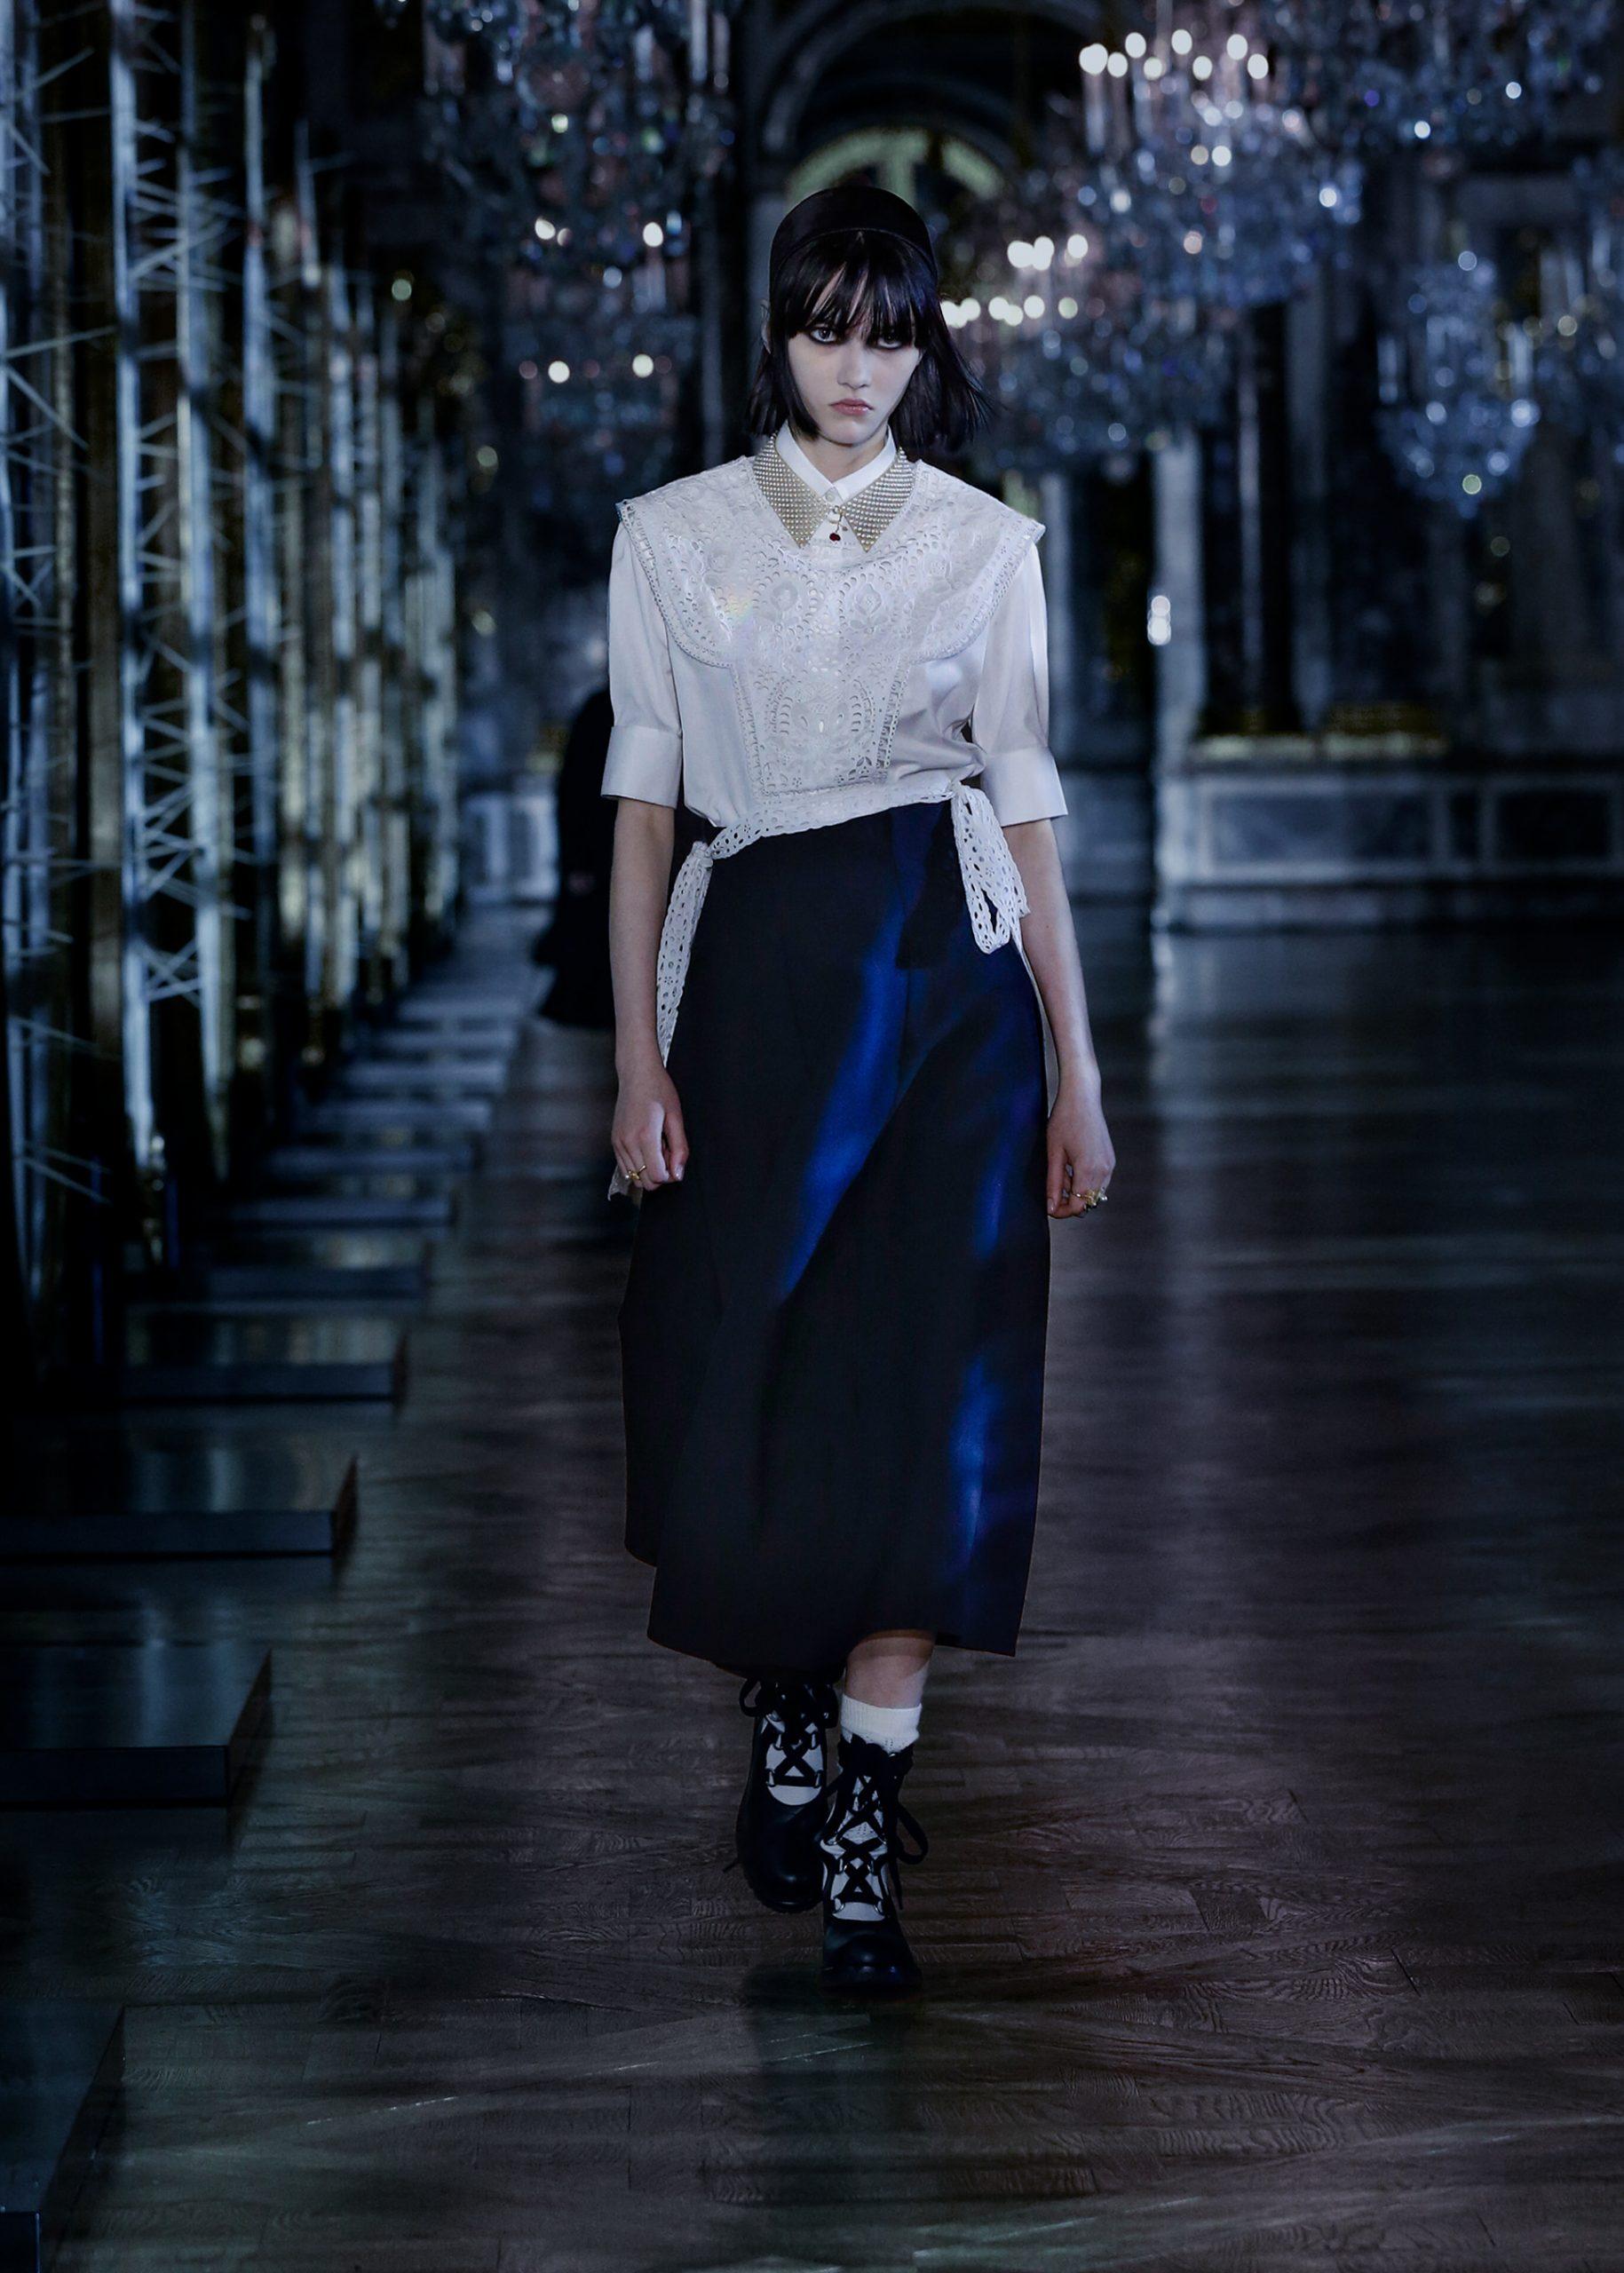 Christian Dior Fall 2021 Film